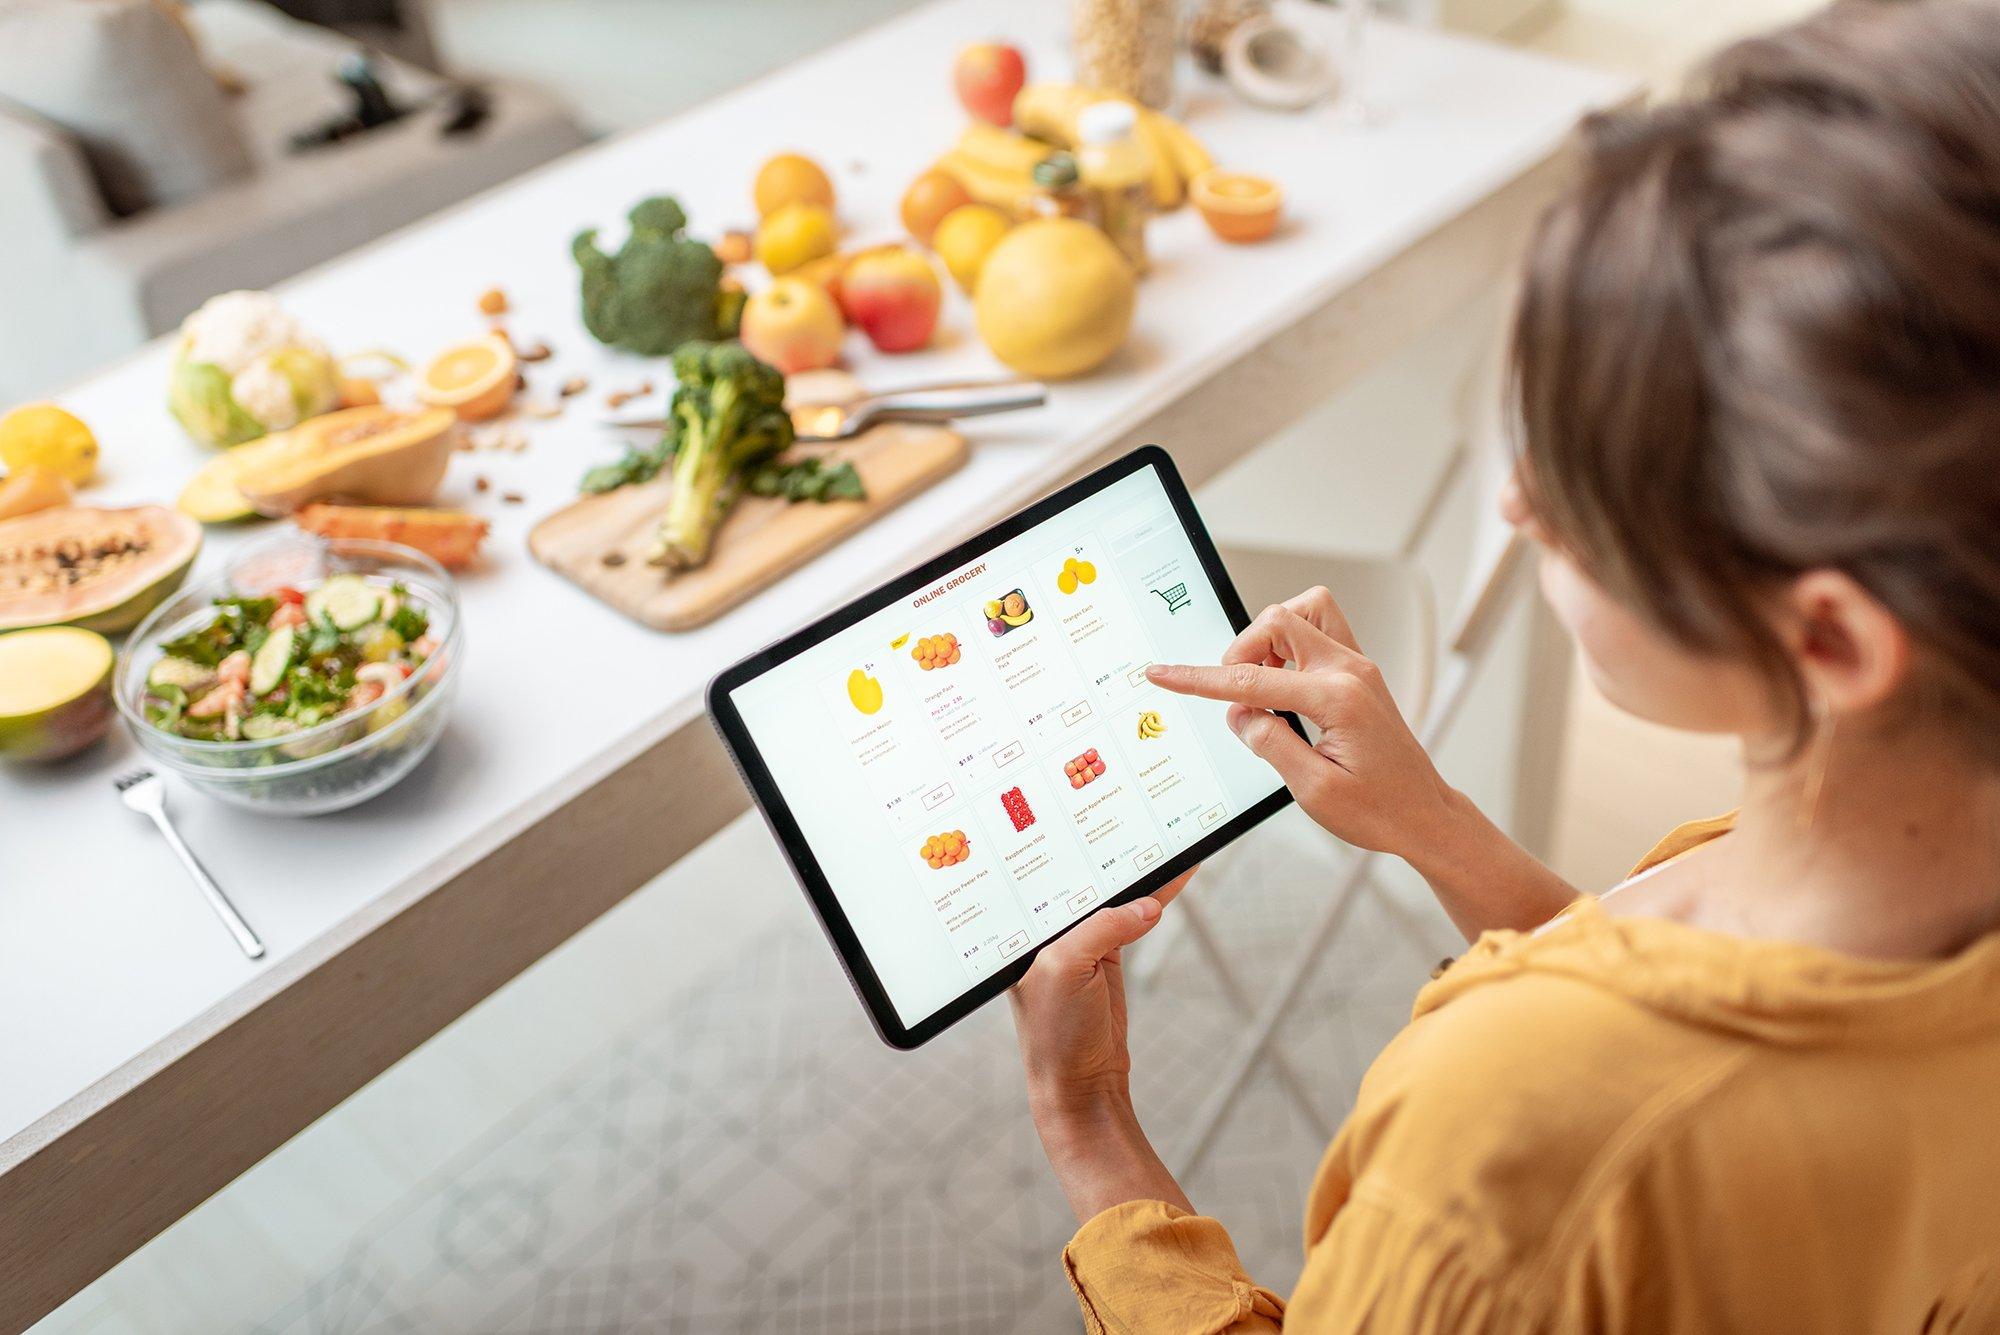 shopping-food-online-33EUDSG